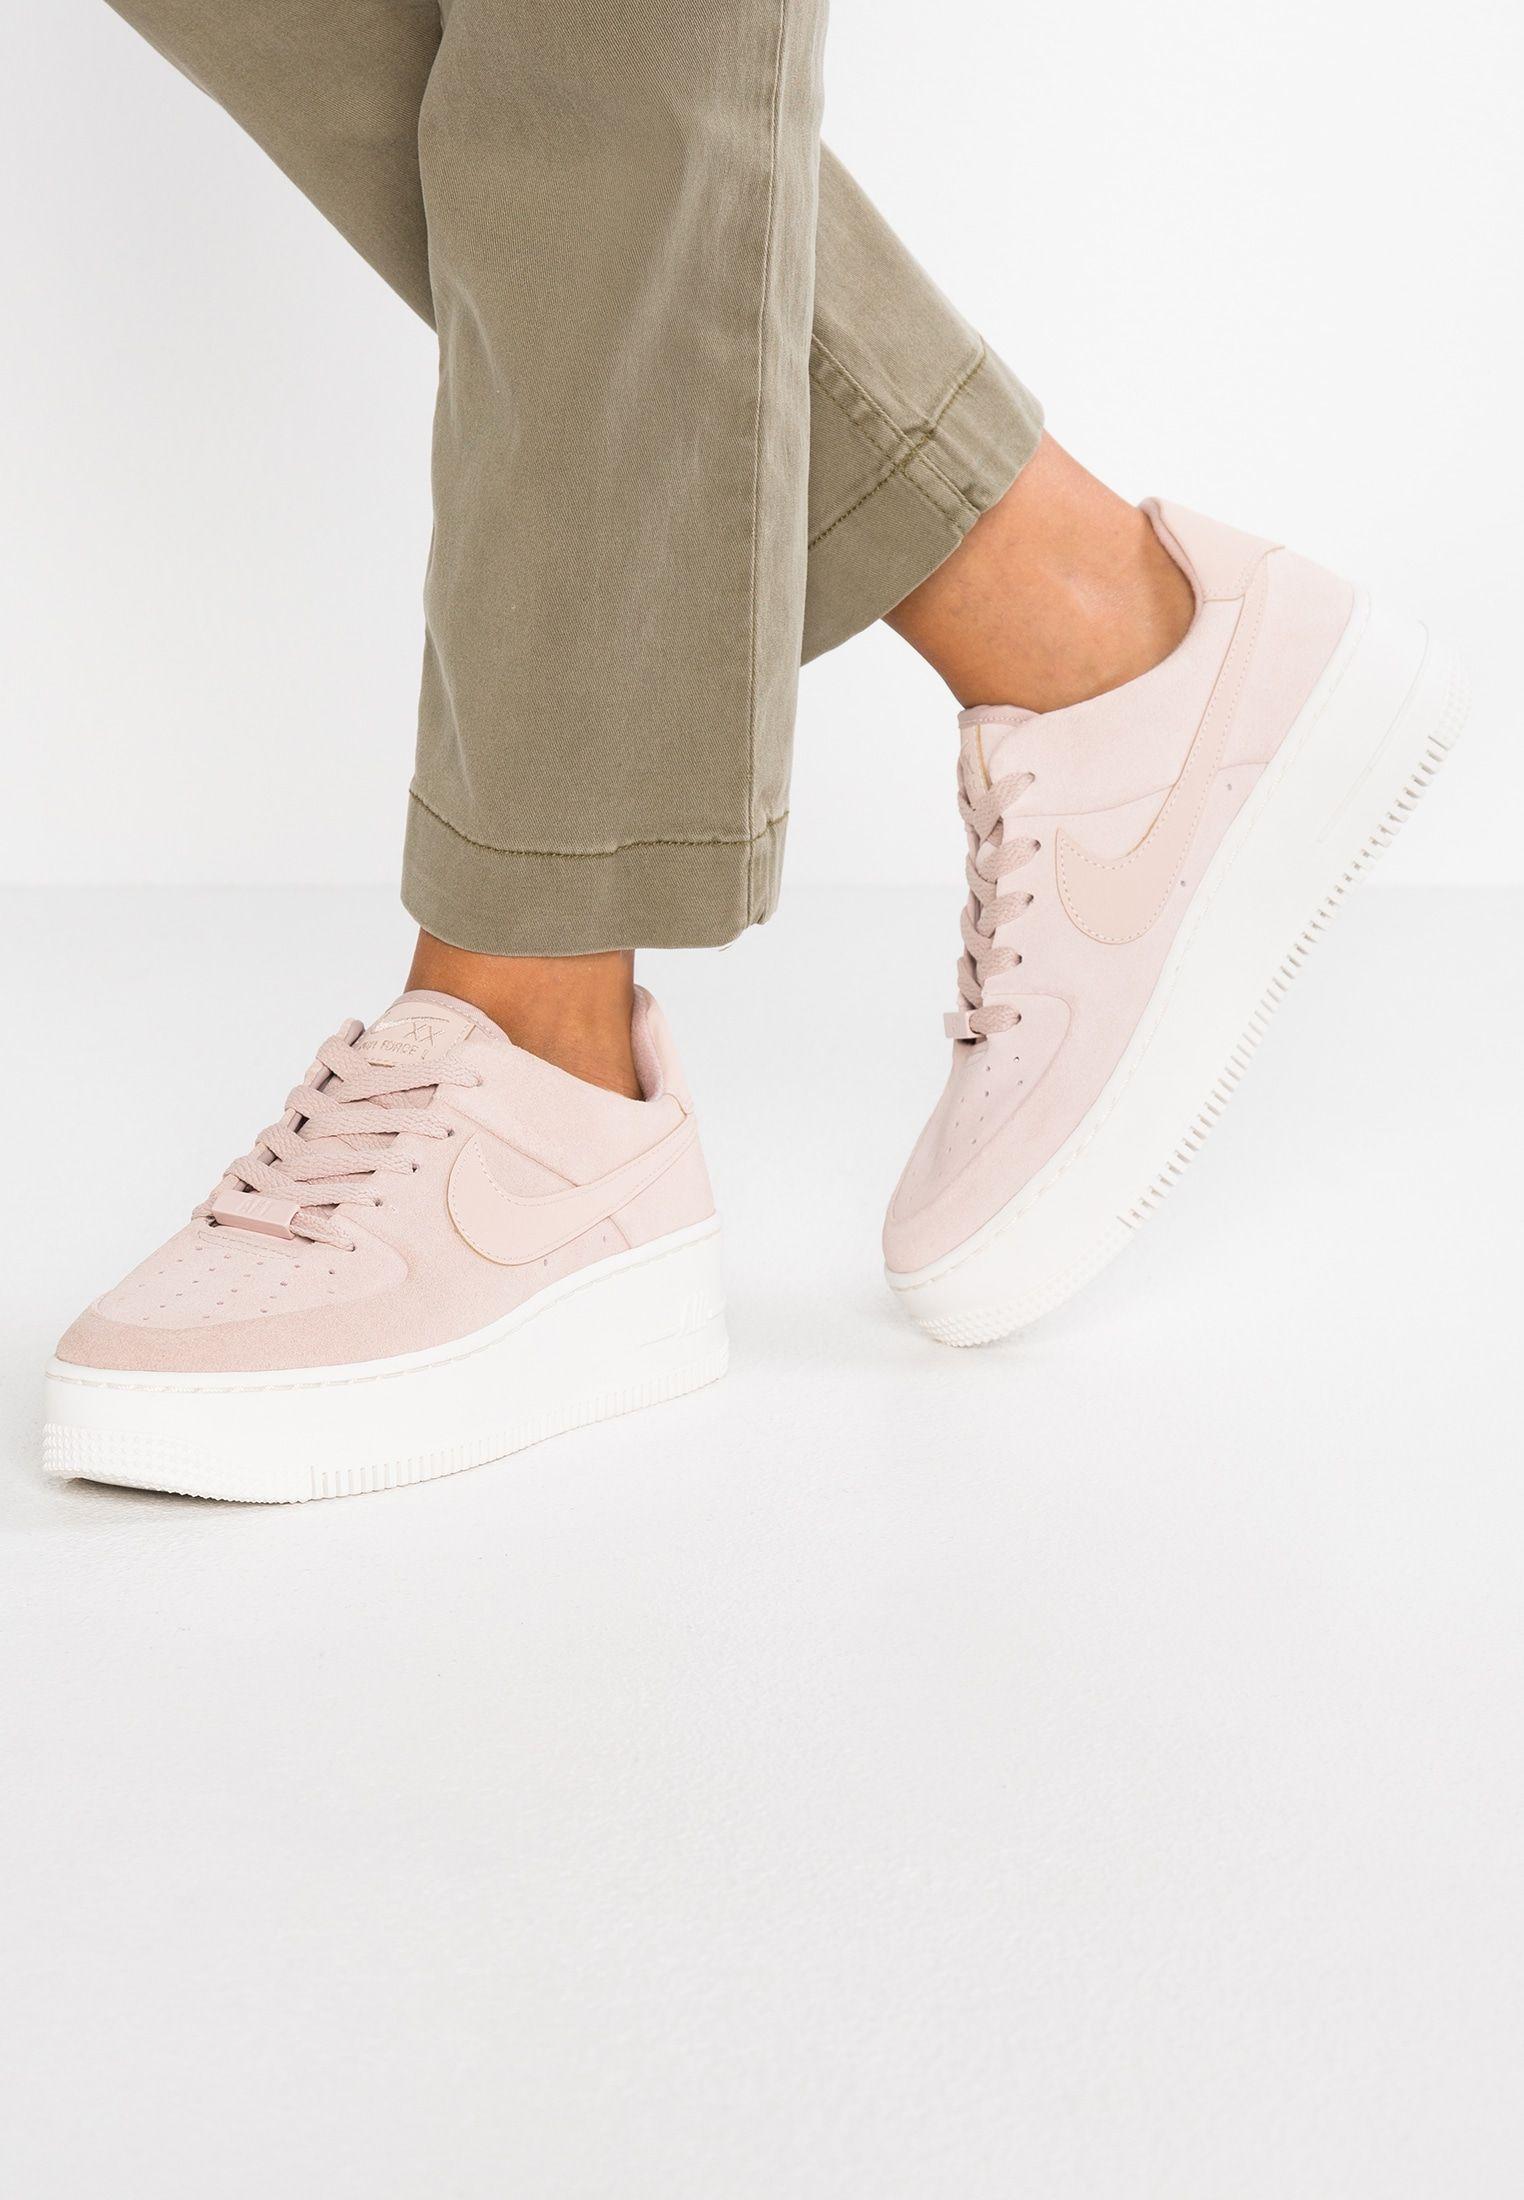 buy online 18a08 bbe3e Nike Sportswear AIR FORCE 1 SAGE - Sneakers - particle beige phantom -  Zalando.